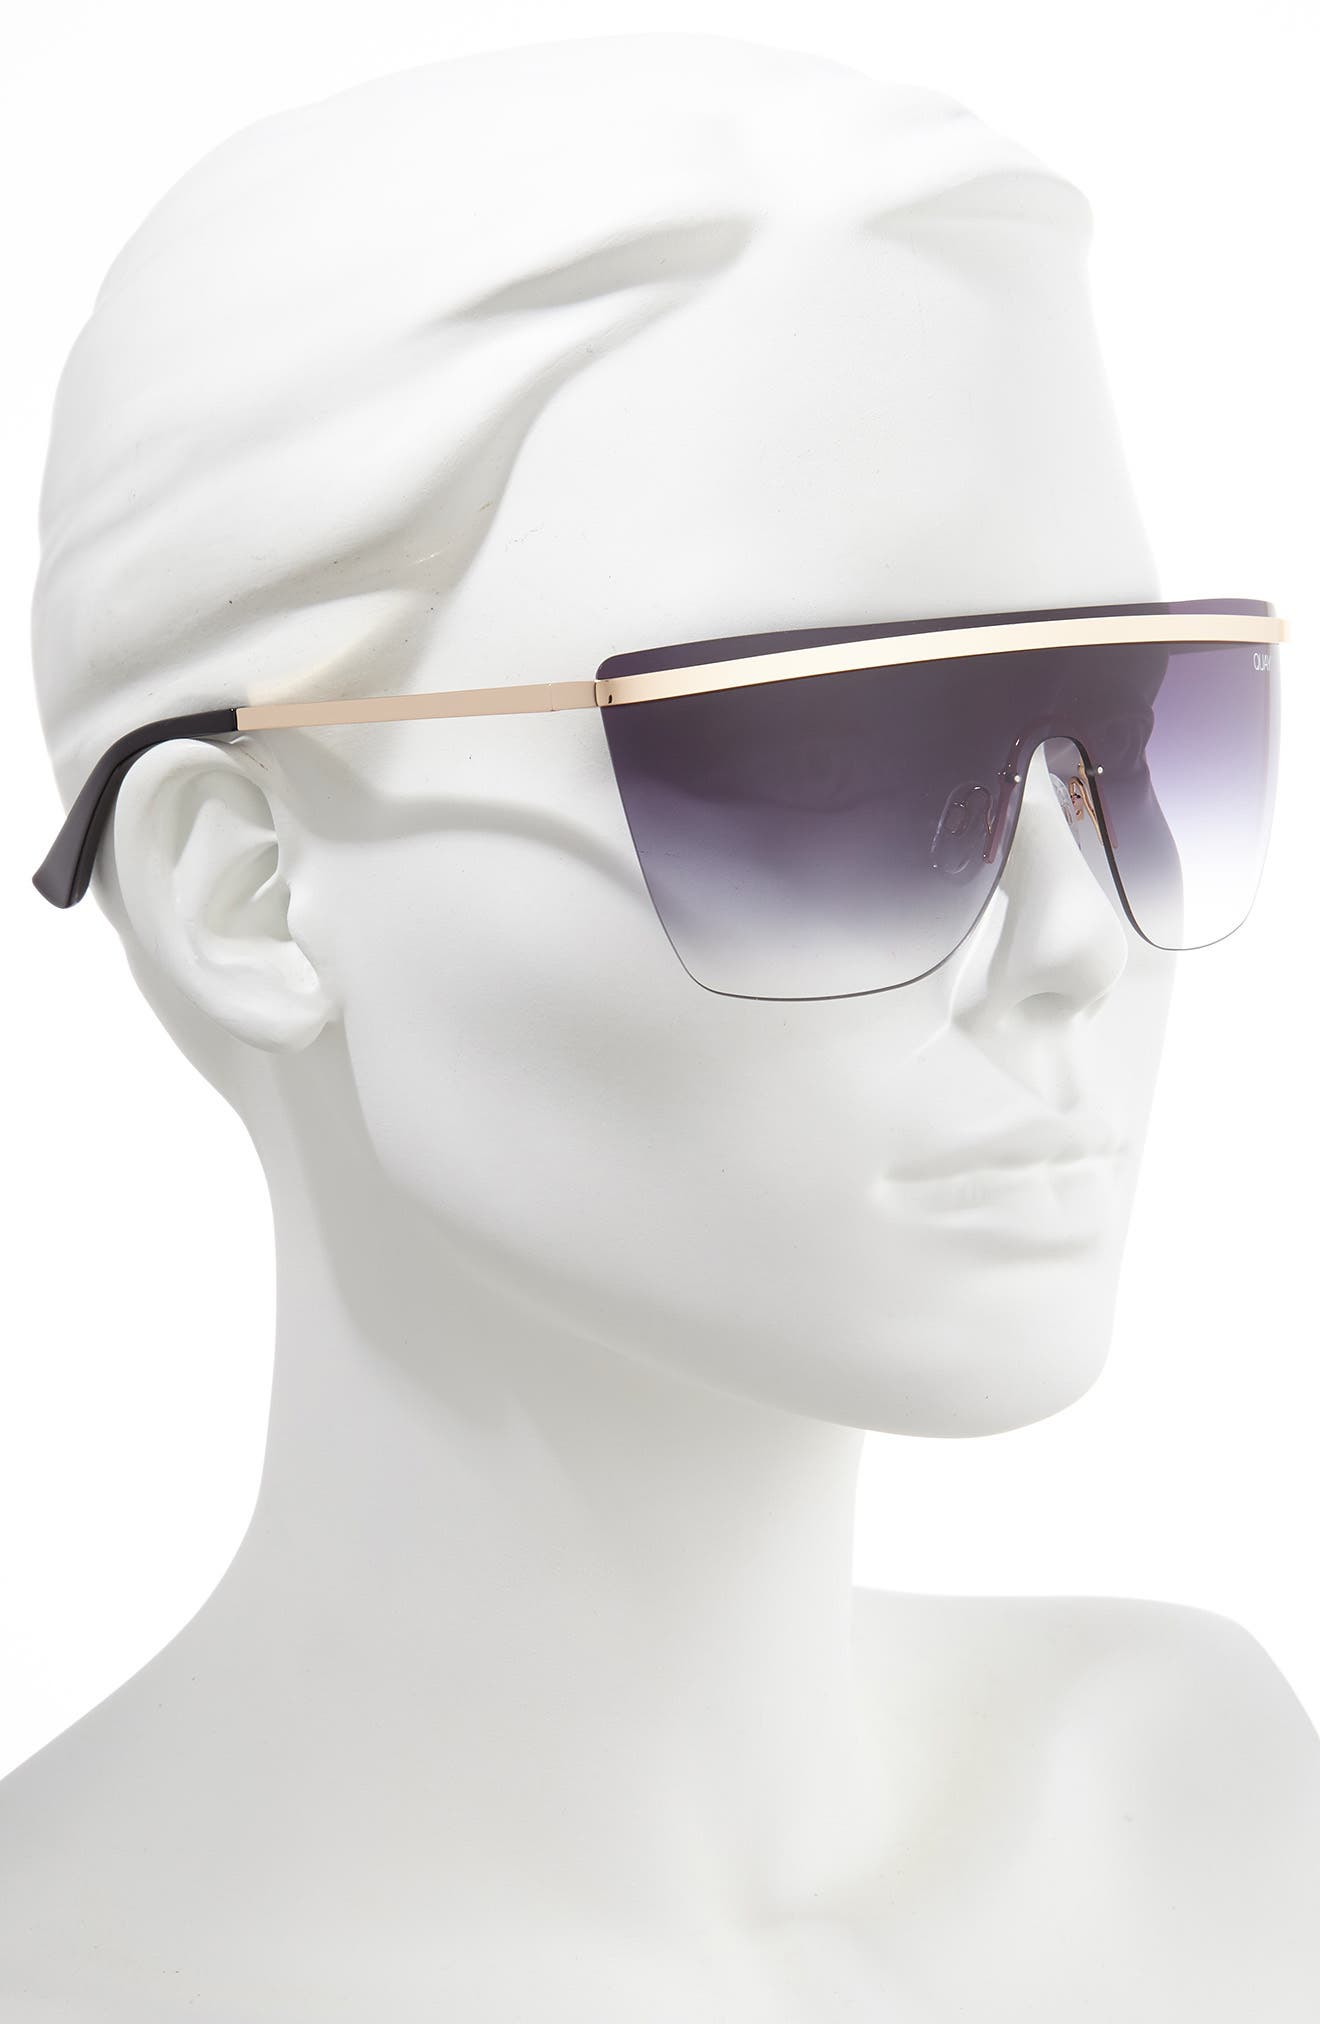 QUAY AUSTRALIA, x JLO Get Right 54mm Flat Top Shield Sunglasses, Alternate thumbnail 2, color, GOLD/ BLACK FADE